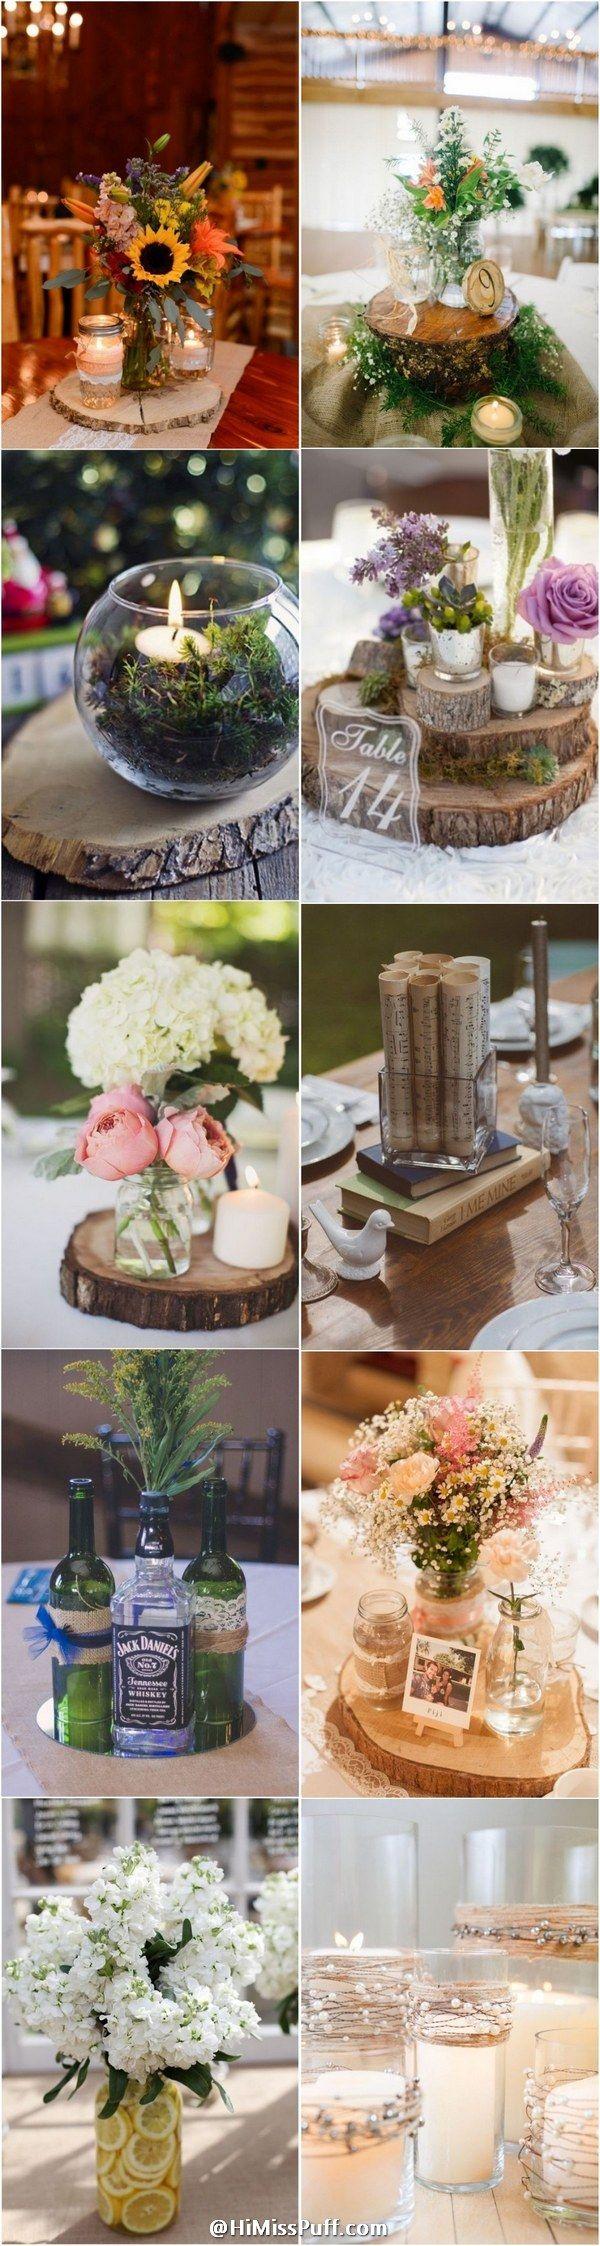 Country Rustic Wedding Centerpiece Ideas / http://www.himisspuff.com/rustic-wedding-centerpiece-ideas/